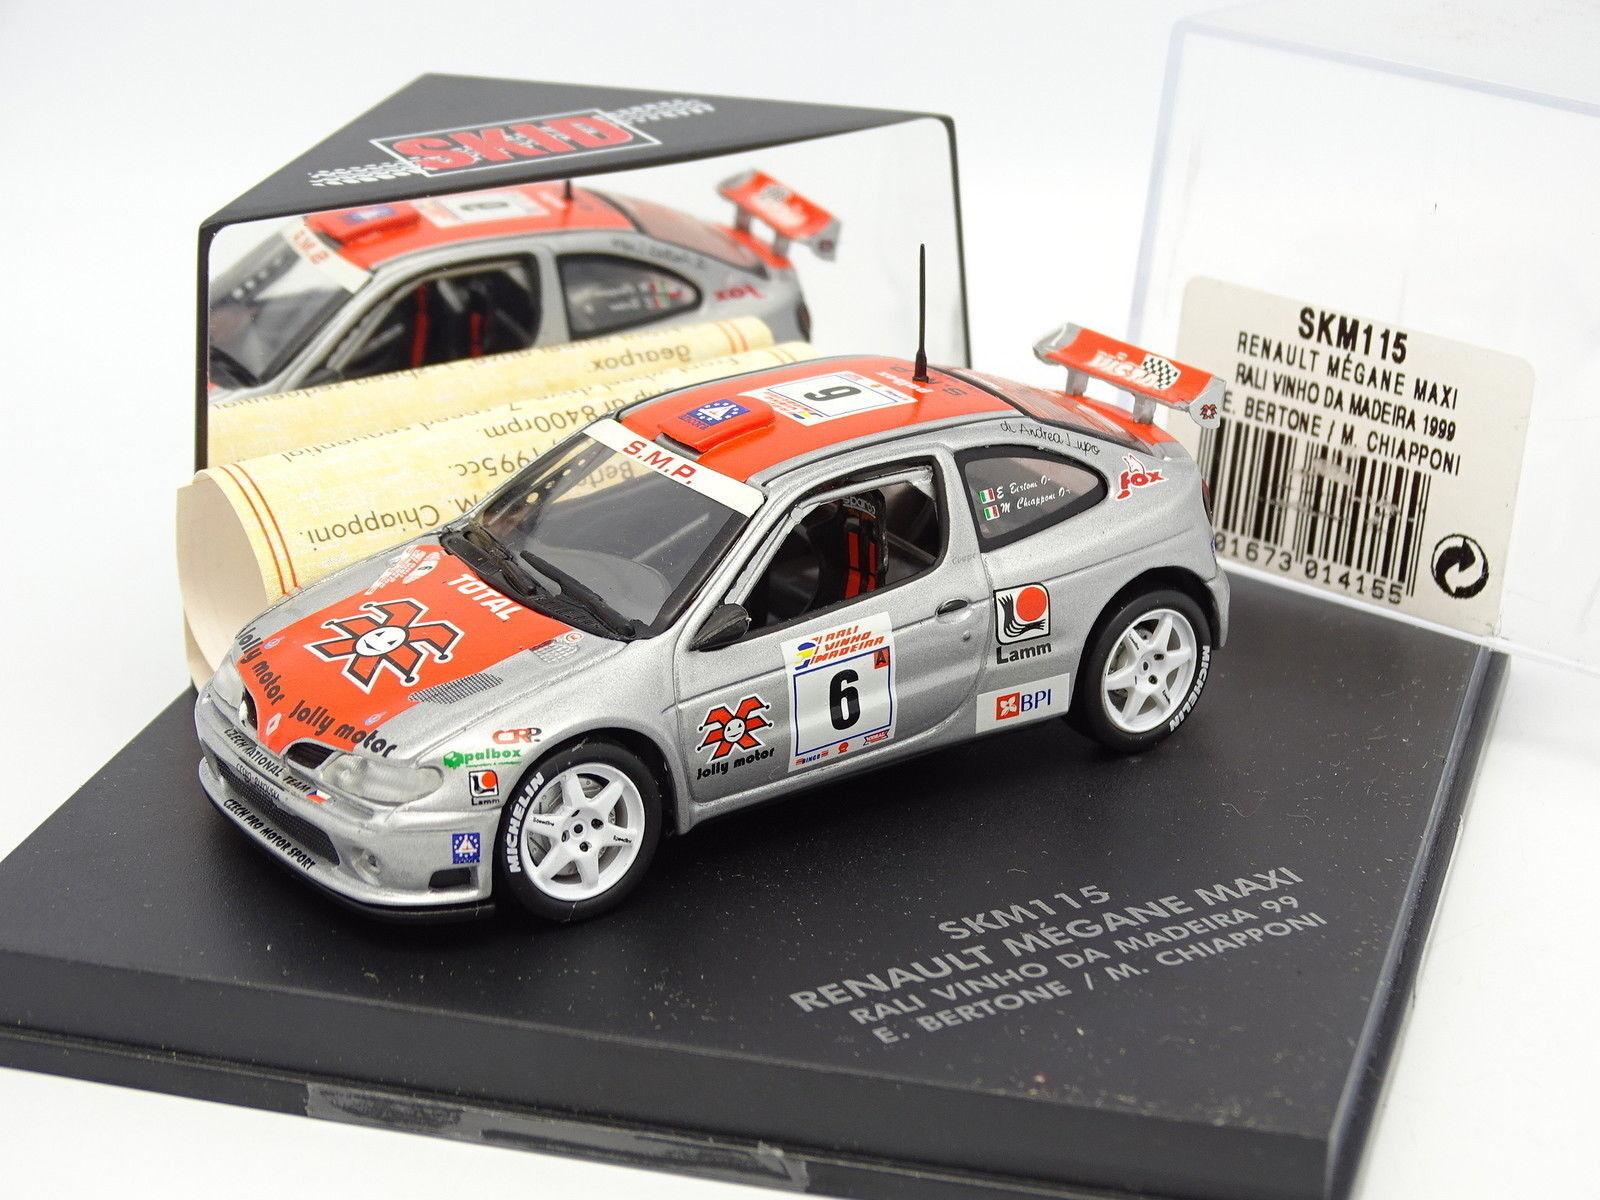 Skid Velocidad 1 43 43 43 - Renault Megane Maxi Rallye Vinho Madeira 1999 49f815